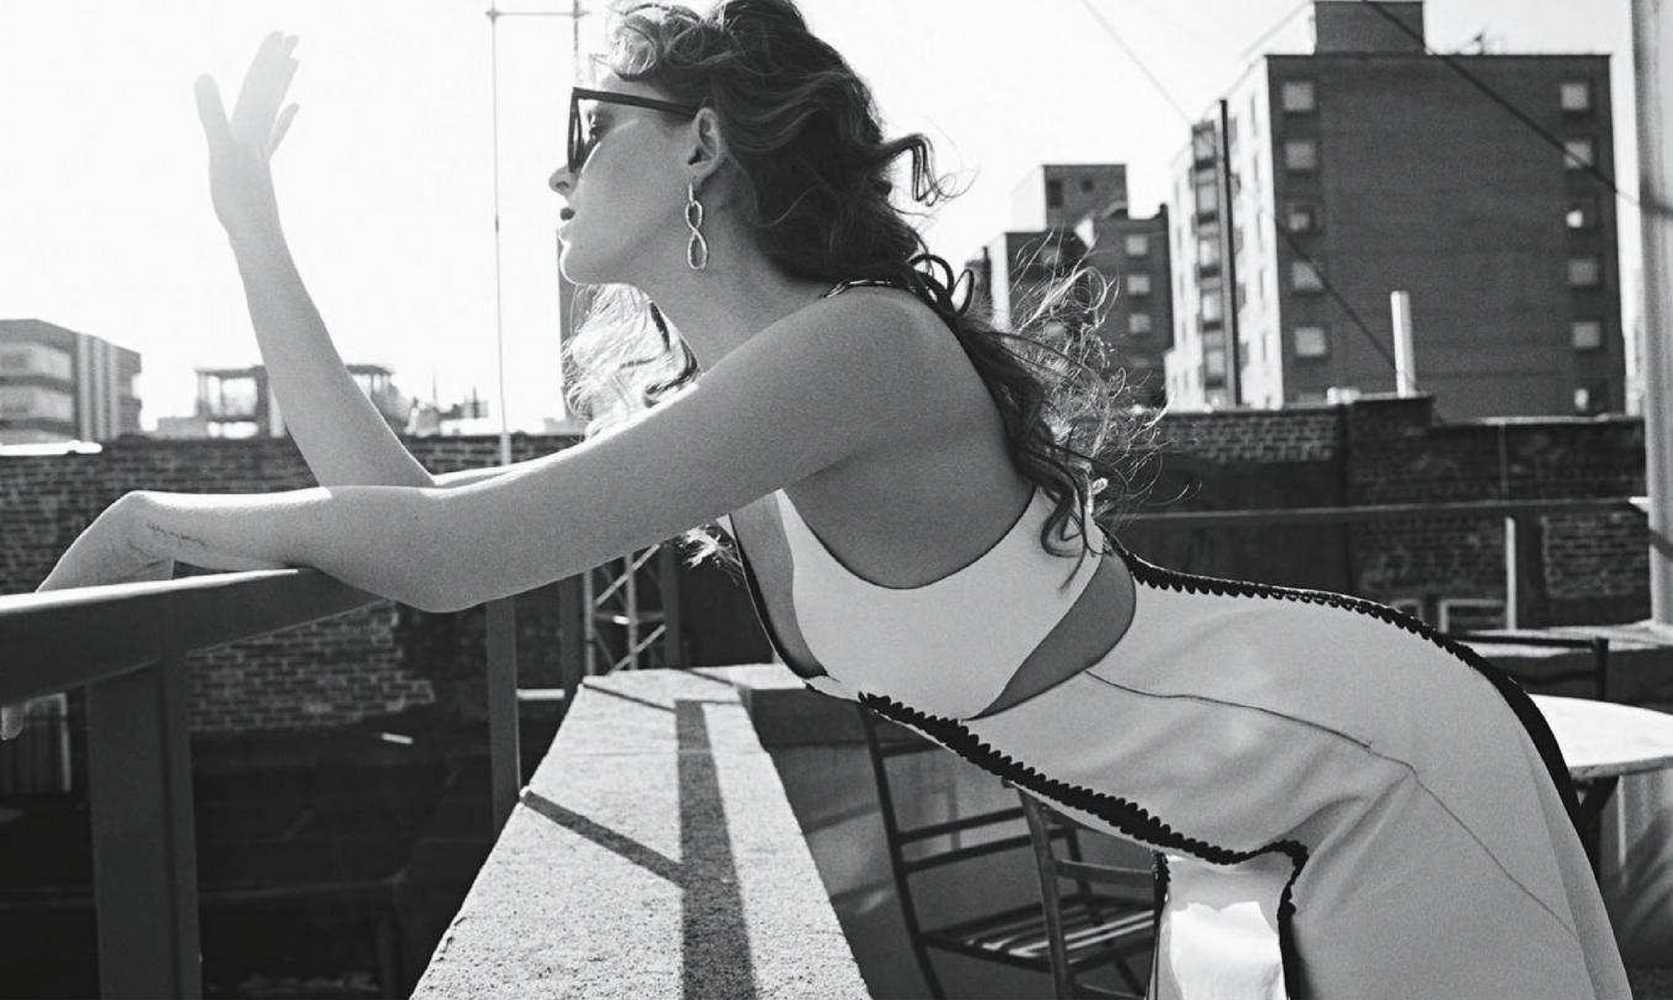 Dakota-Johnson-Emma-Summerton-Photoshoot-for-Vogue-Australia-October-201818718f982742584.jpg